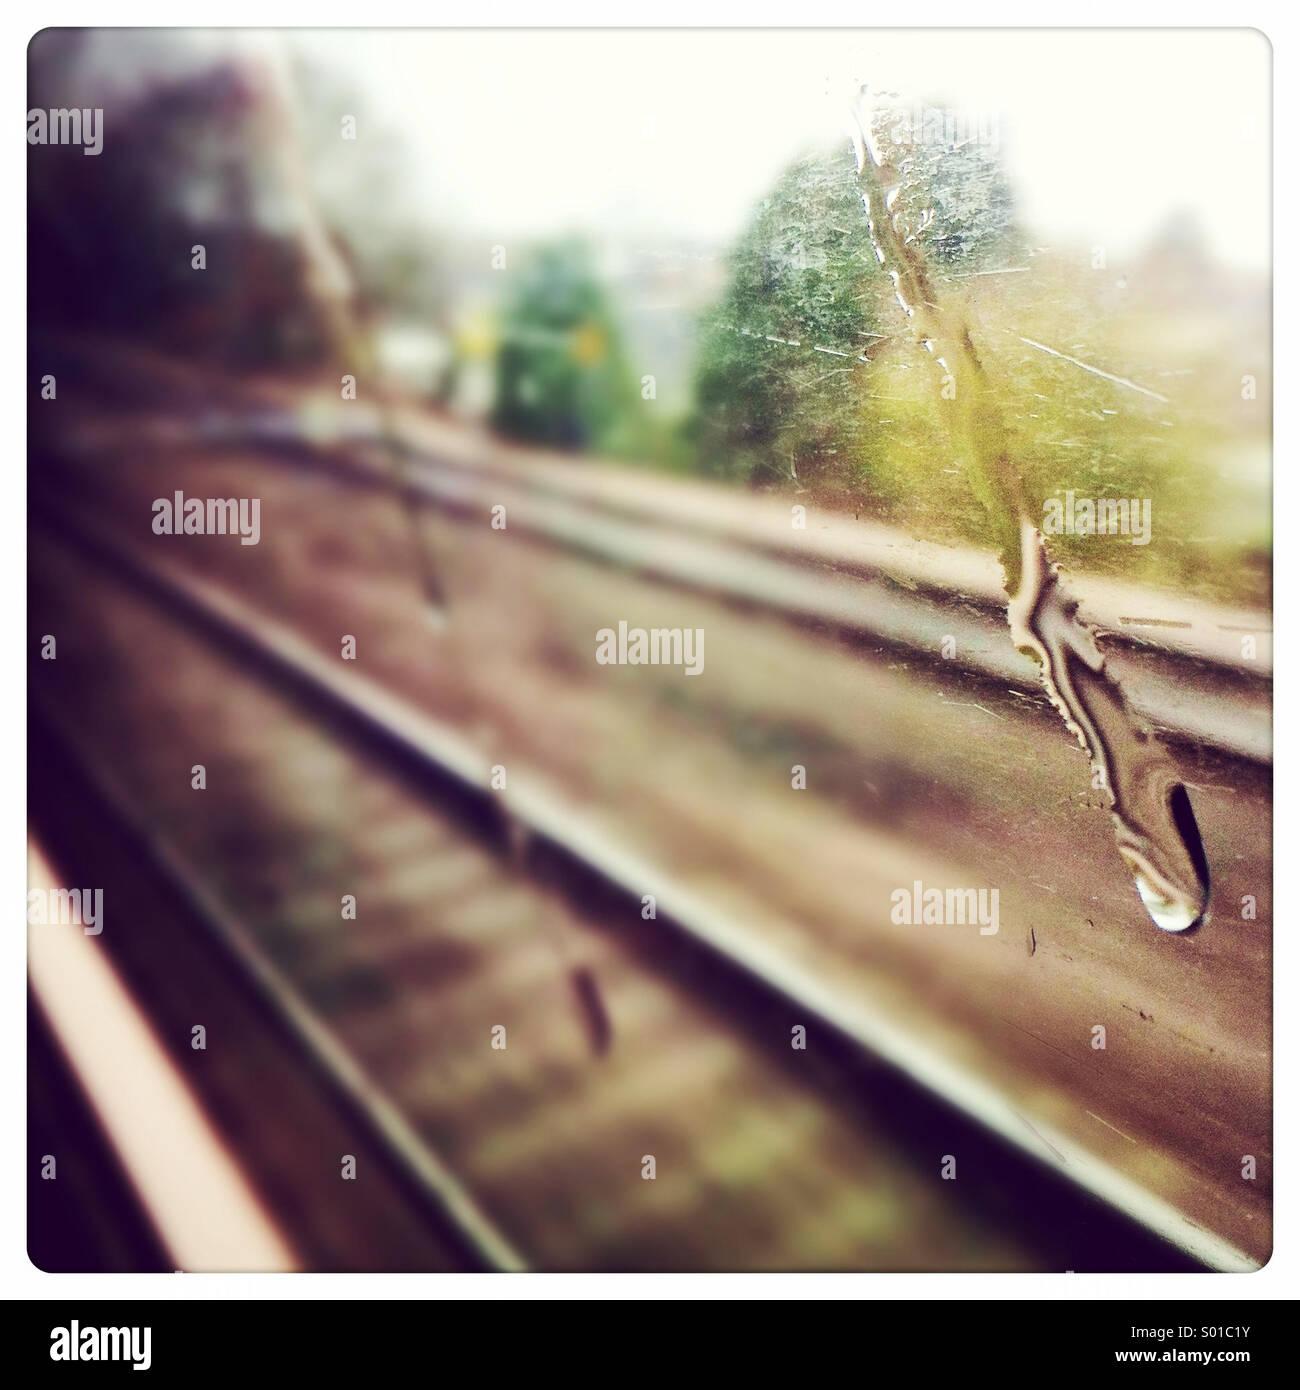 drop-of-water-running-down-a-train-windo